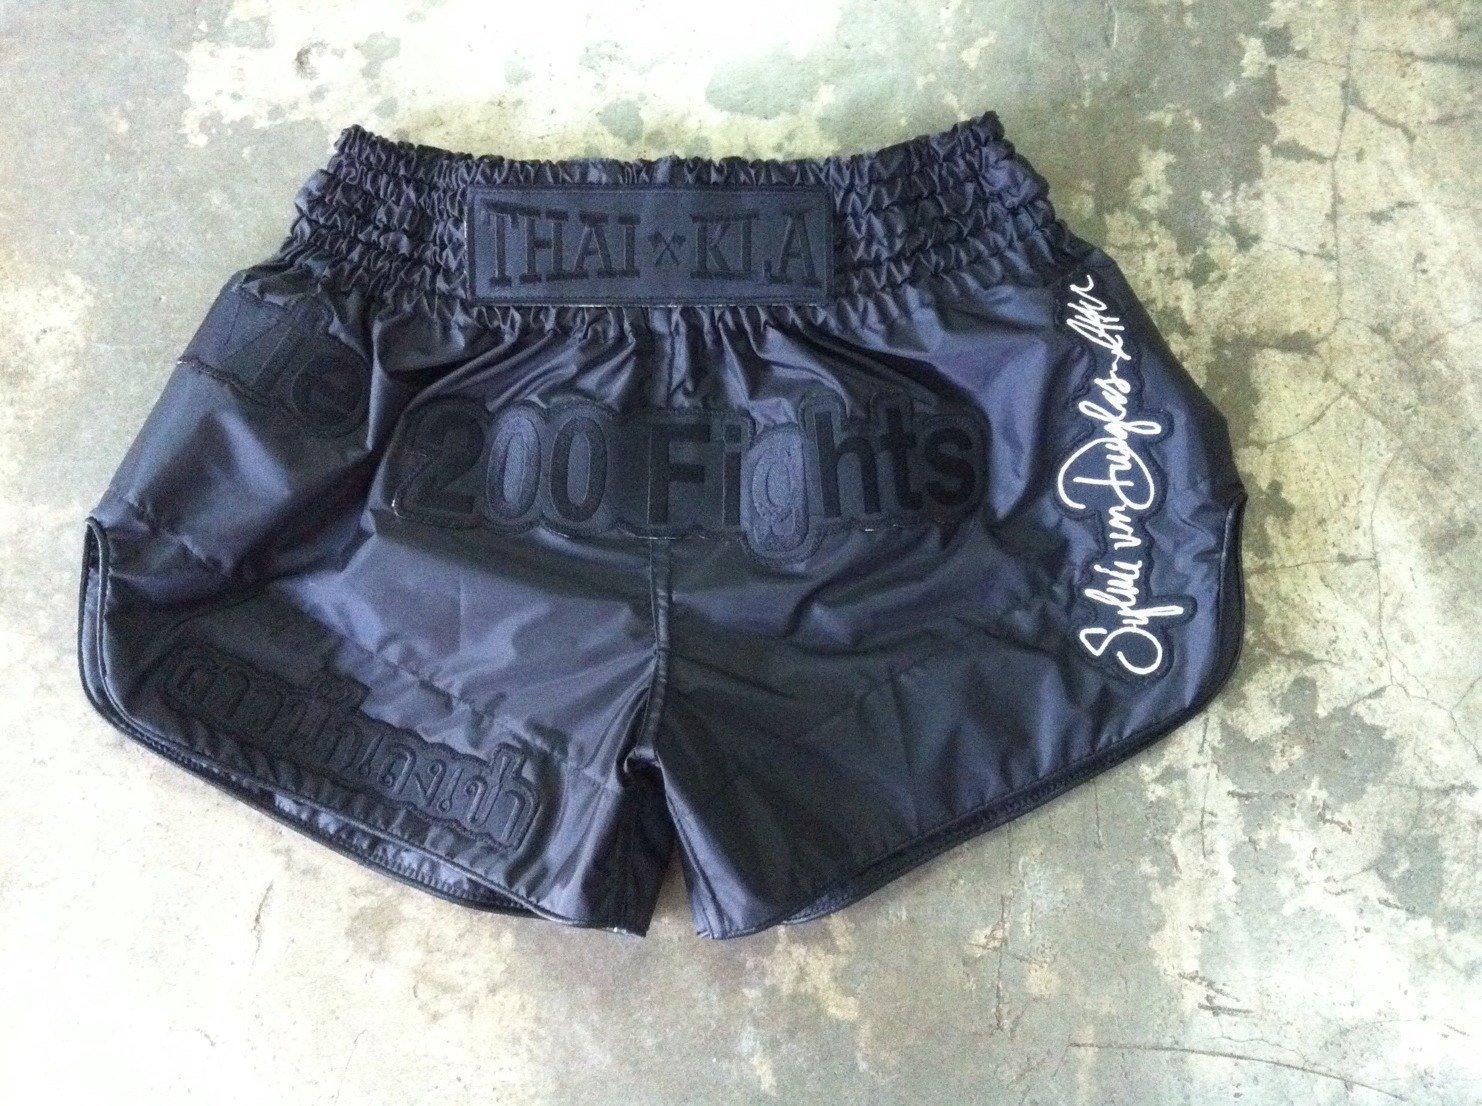 Sylvie Signature 200 Fights Shorts (nylon) | Black on Black